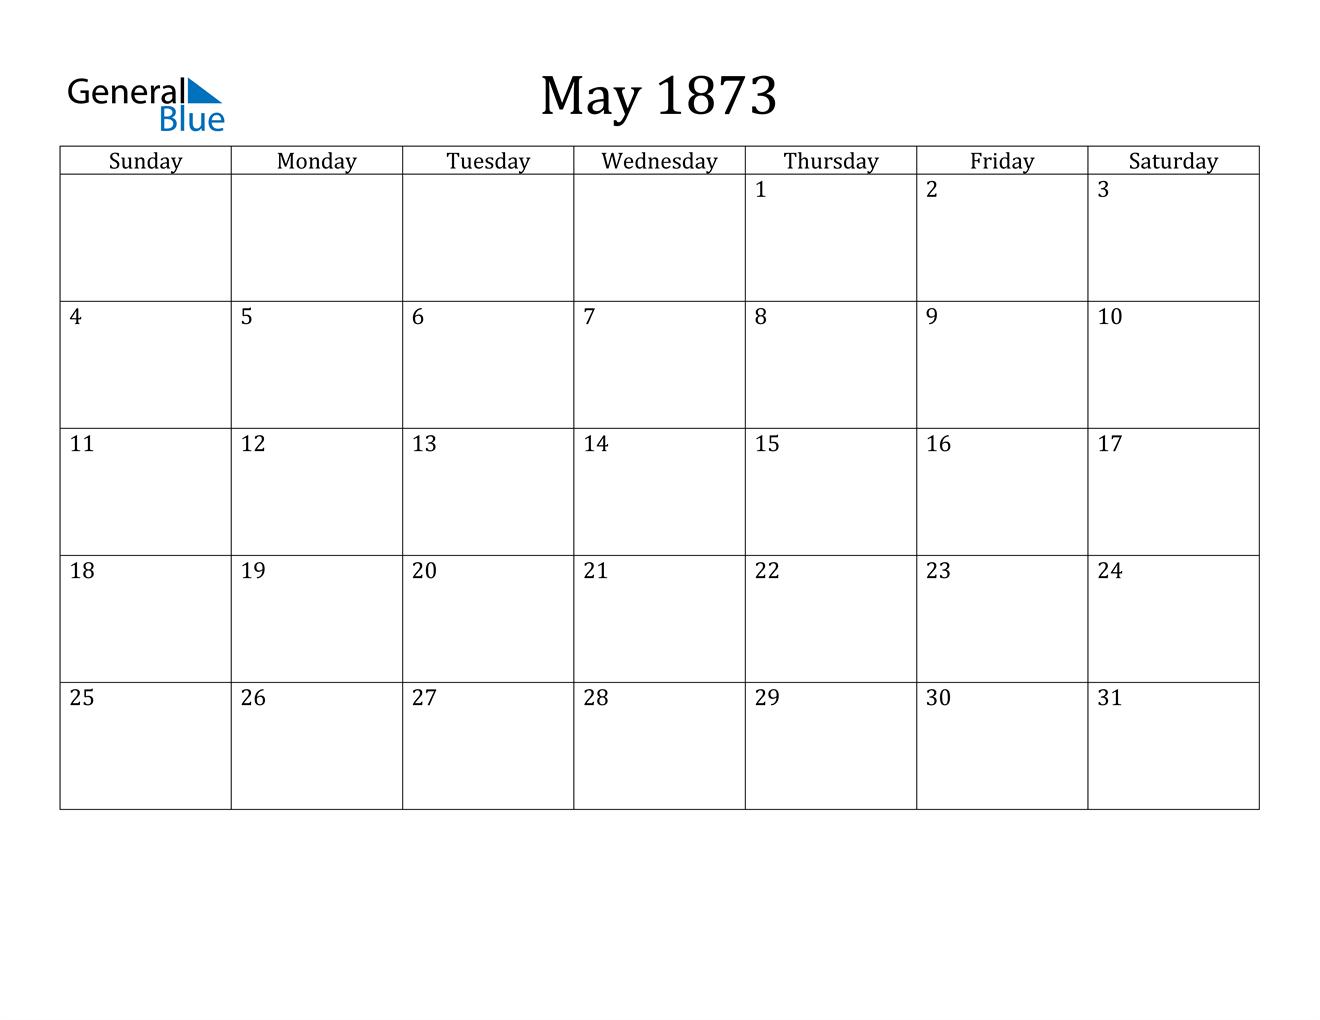 Image of May 1873 Calendar